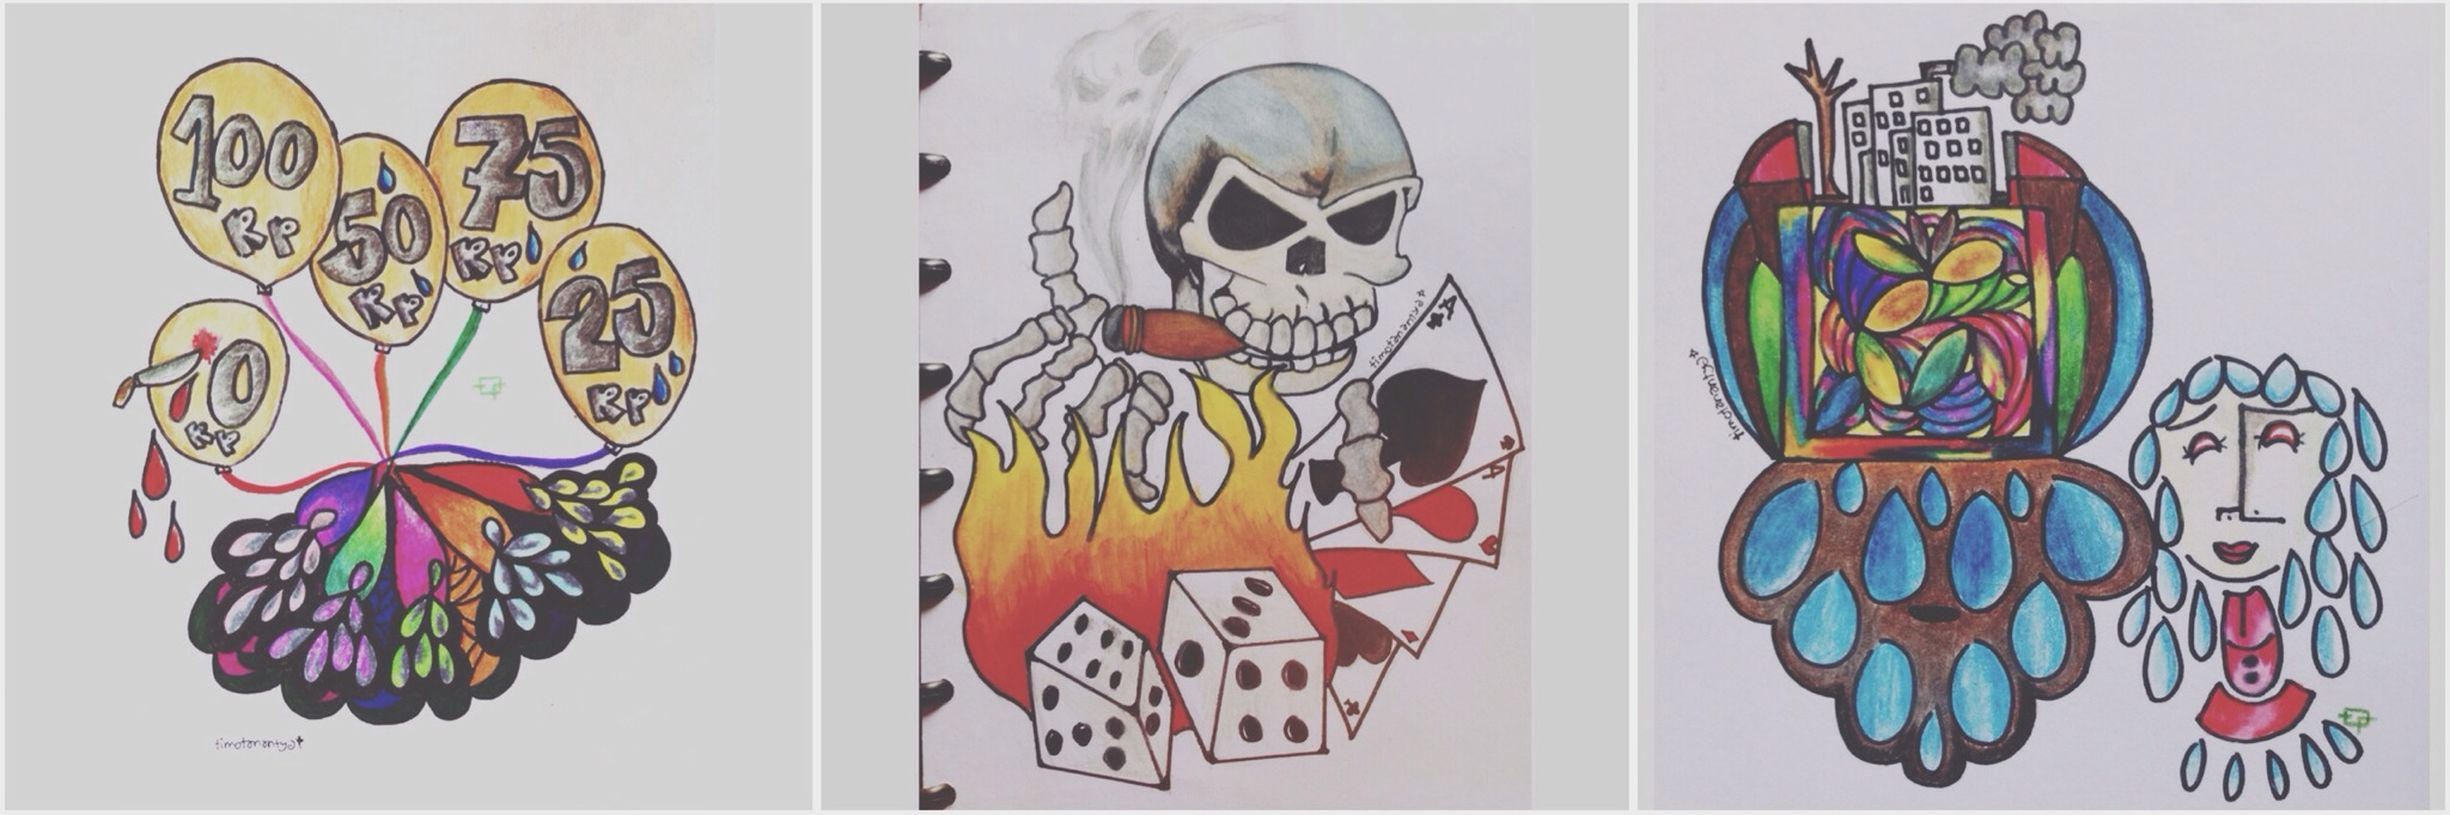 Hell Yeah Drawing Enjoying Life Street Art by Timot Anantya :))